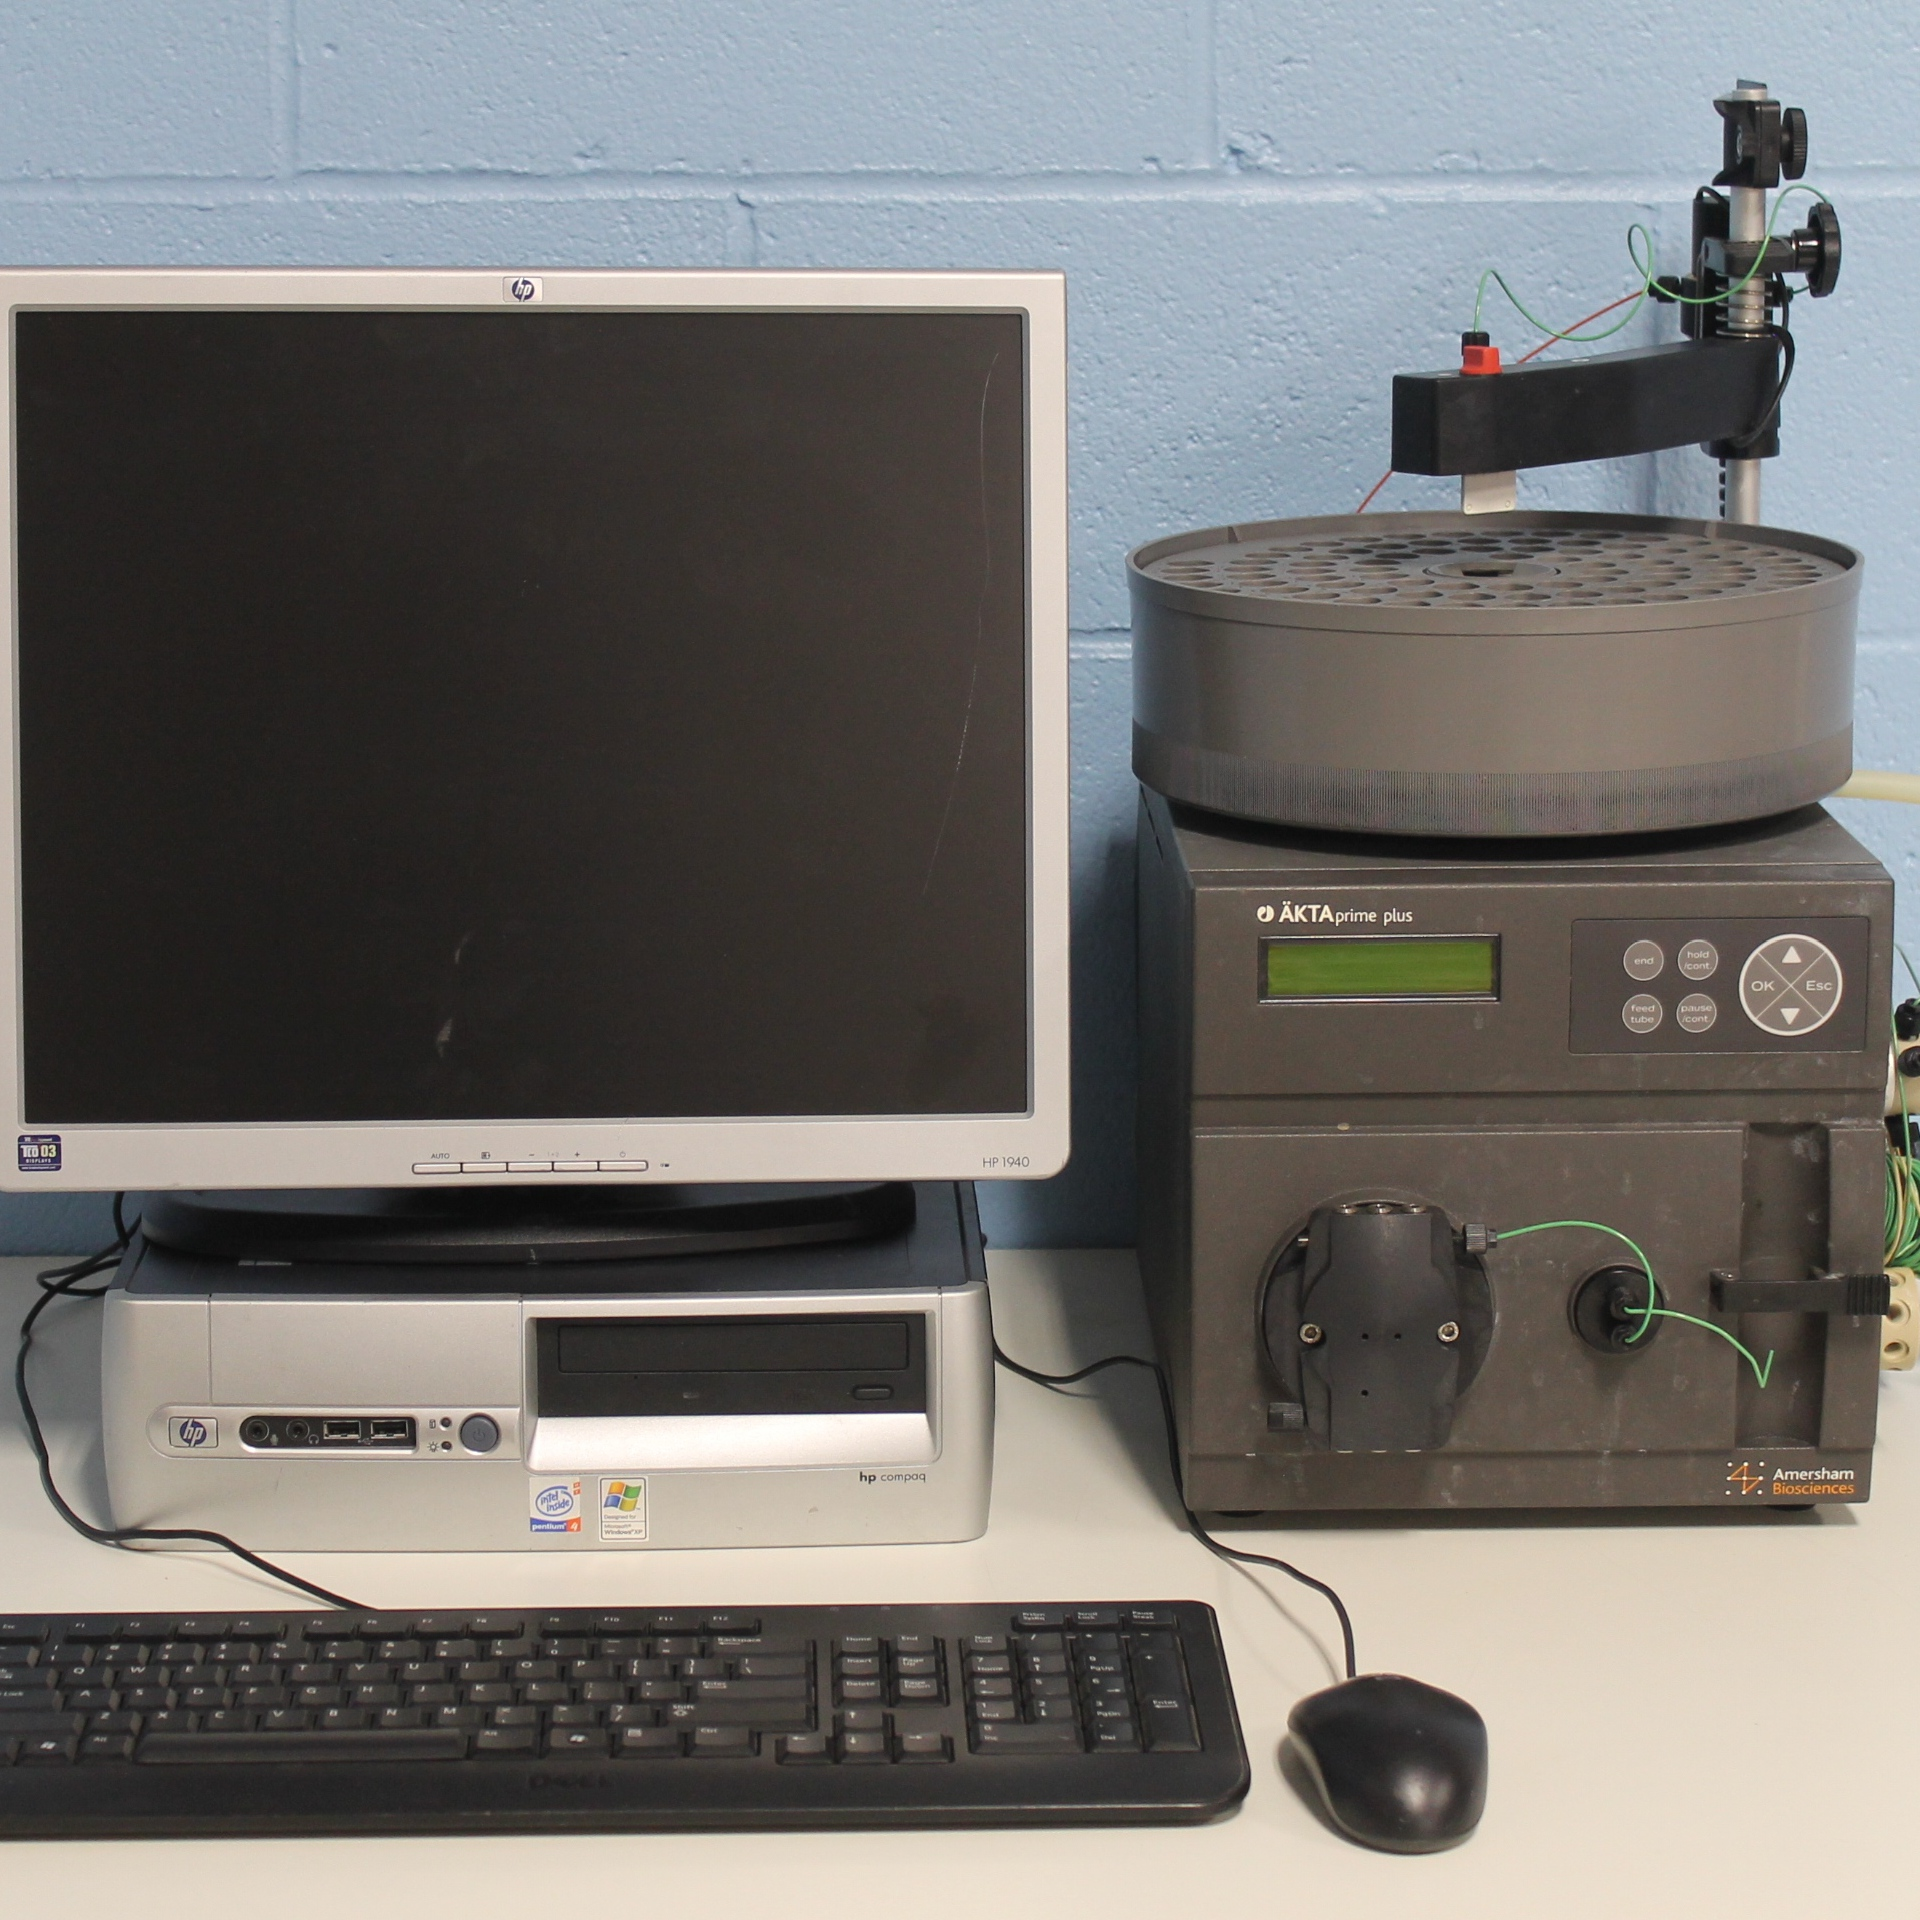 Amersham Biosciences AKTA PrimePlus Automated Liquid Chromatography System Code No. 11-0013-13 Image